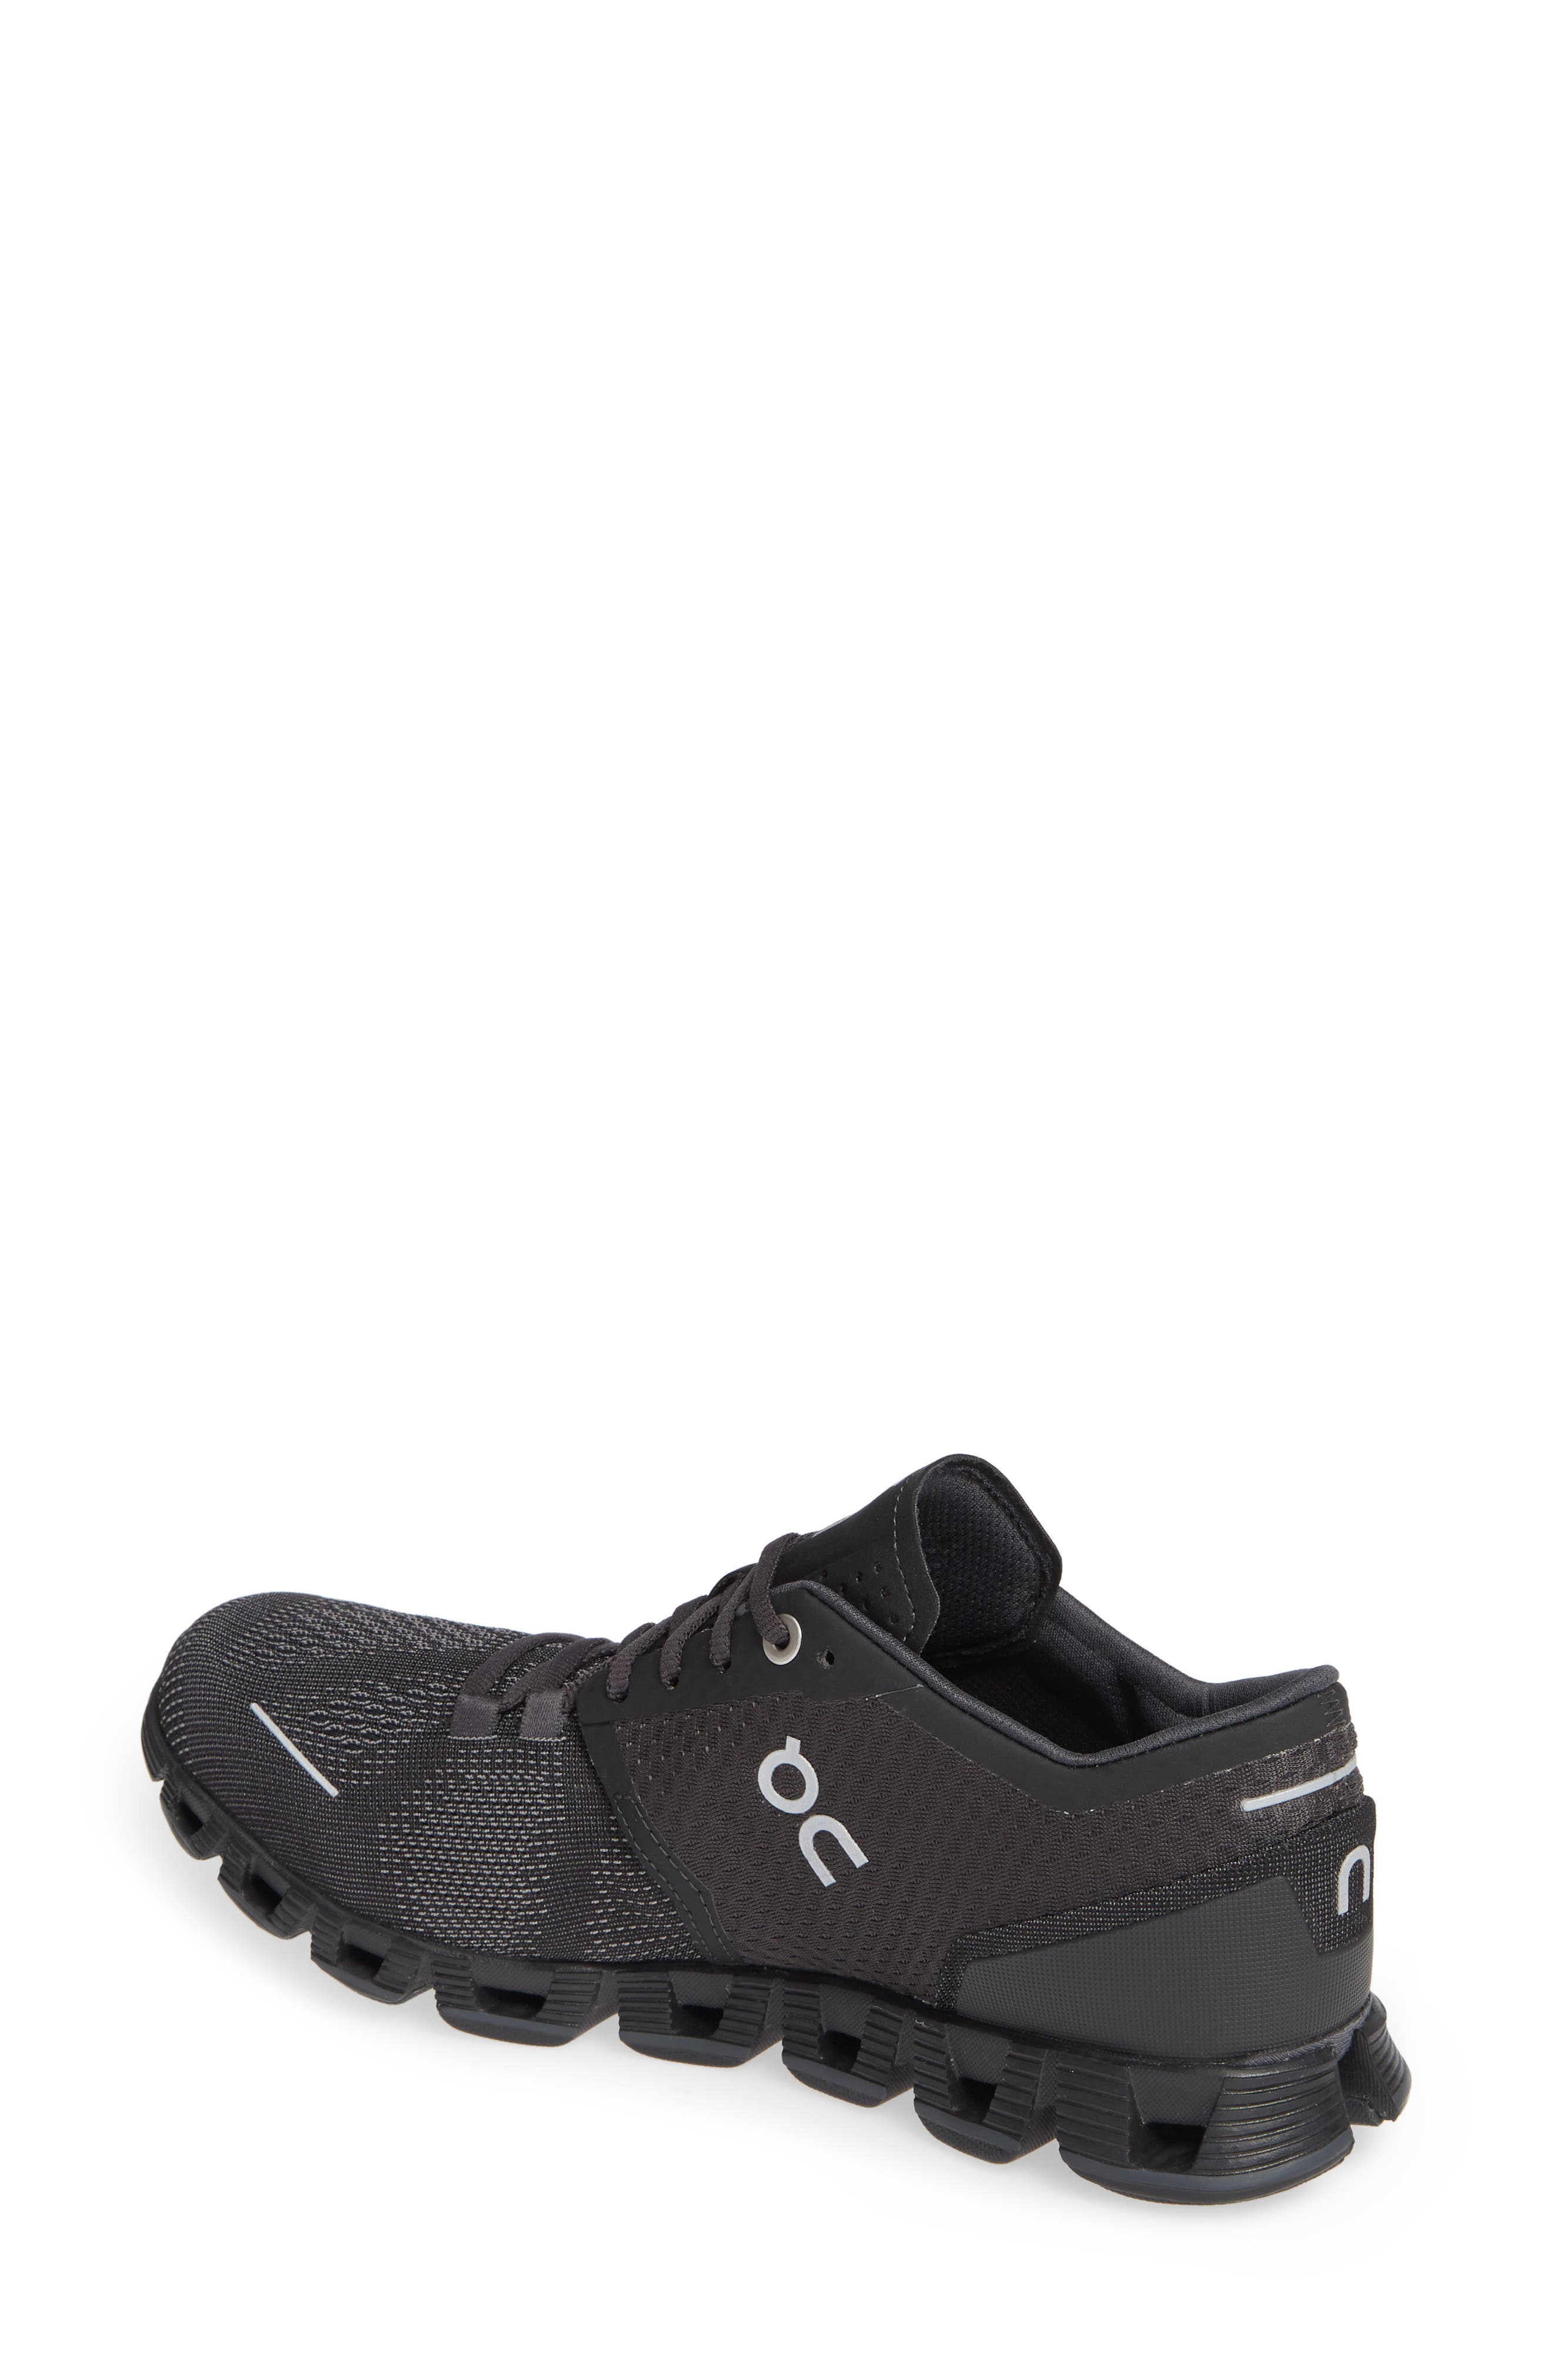 Cloud X Running Shoe,                             Alternate thumbnail 2, color,                             BLACK/ ASPHALT